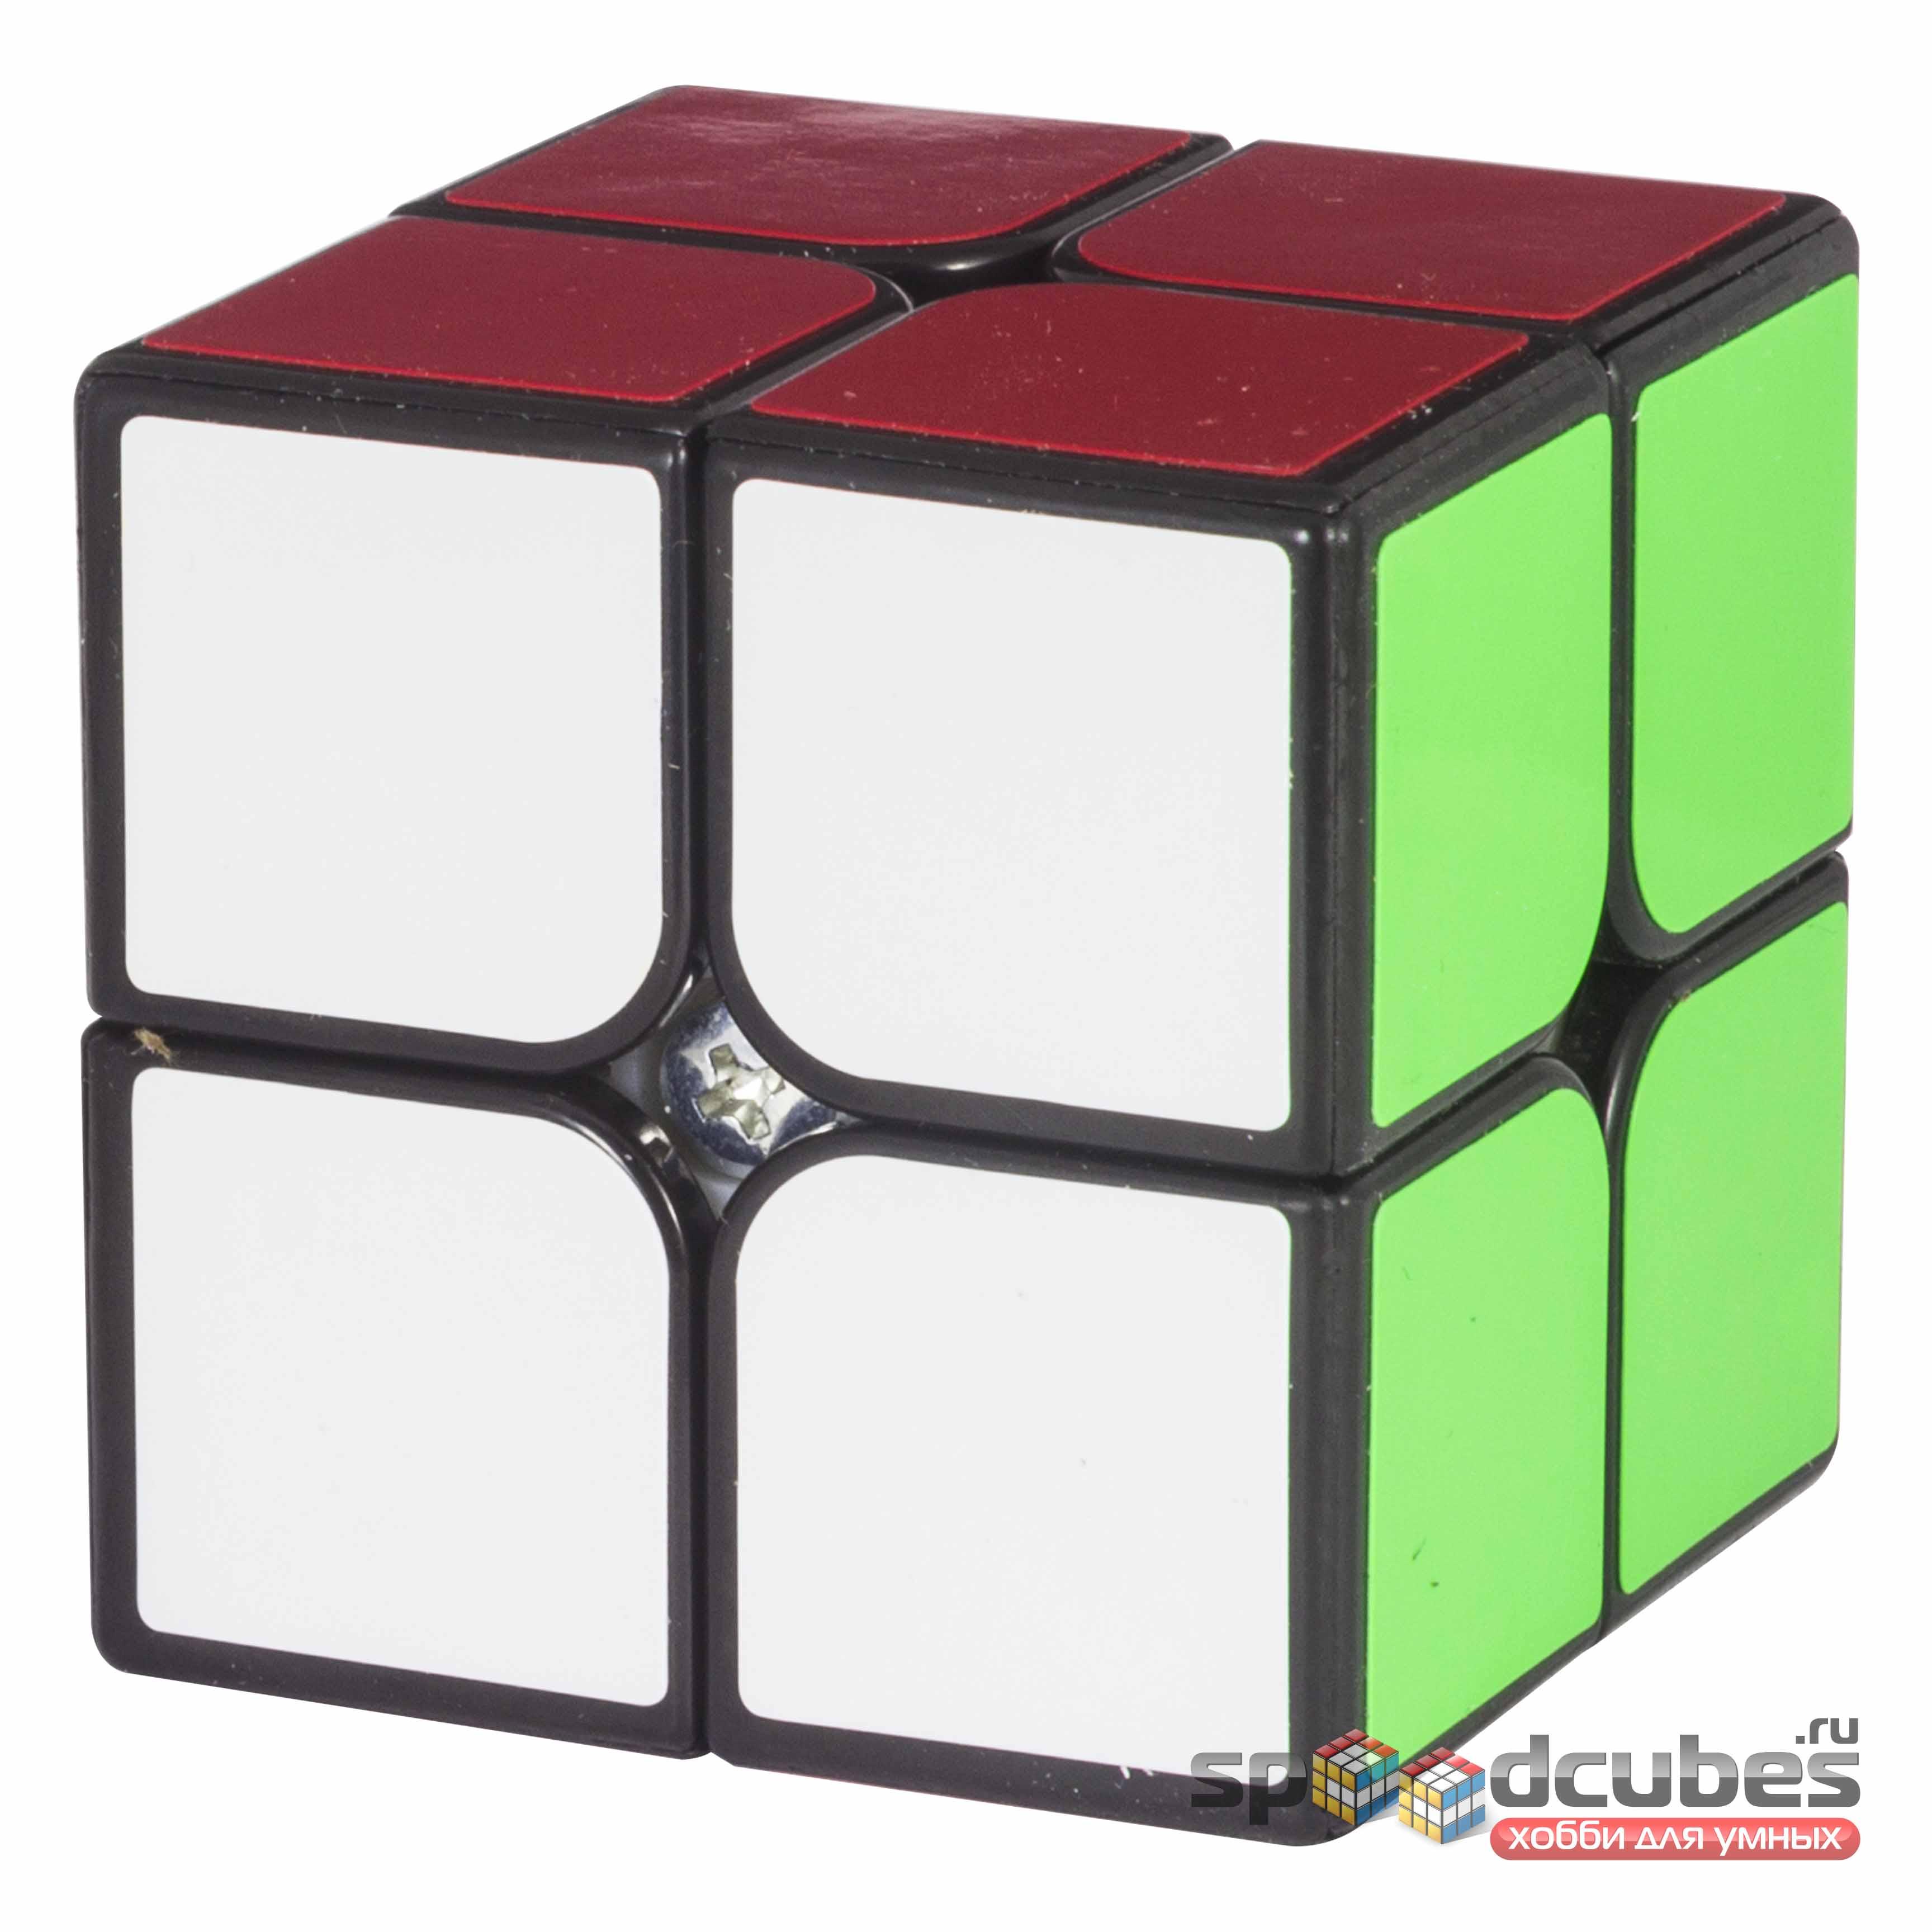 MoYu (YJ) 2x2x2 Yupo 2